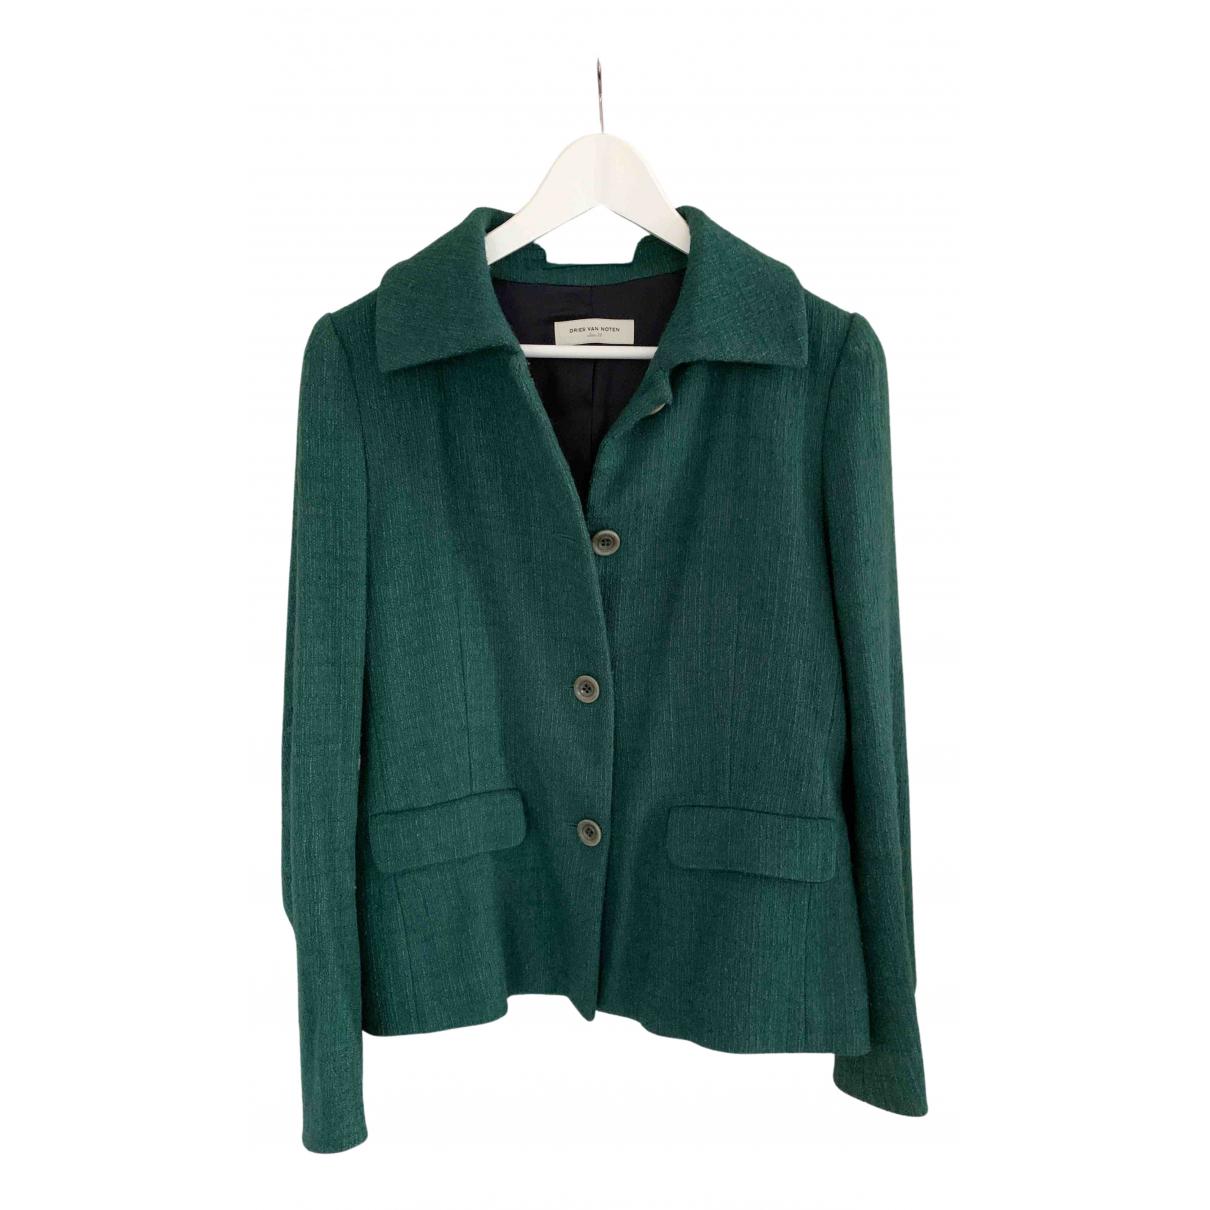 Dries Van Noten \N Green Wool jacket for Women 38 IT